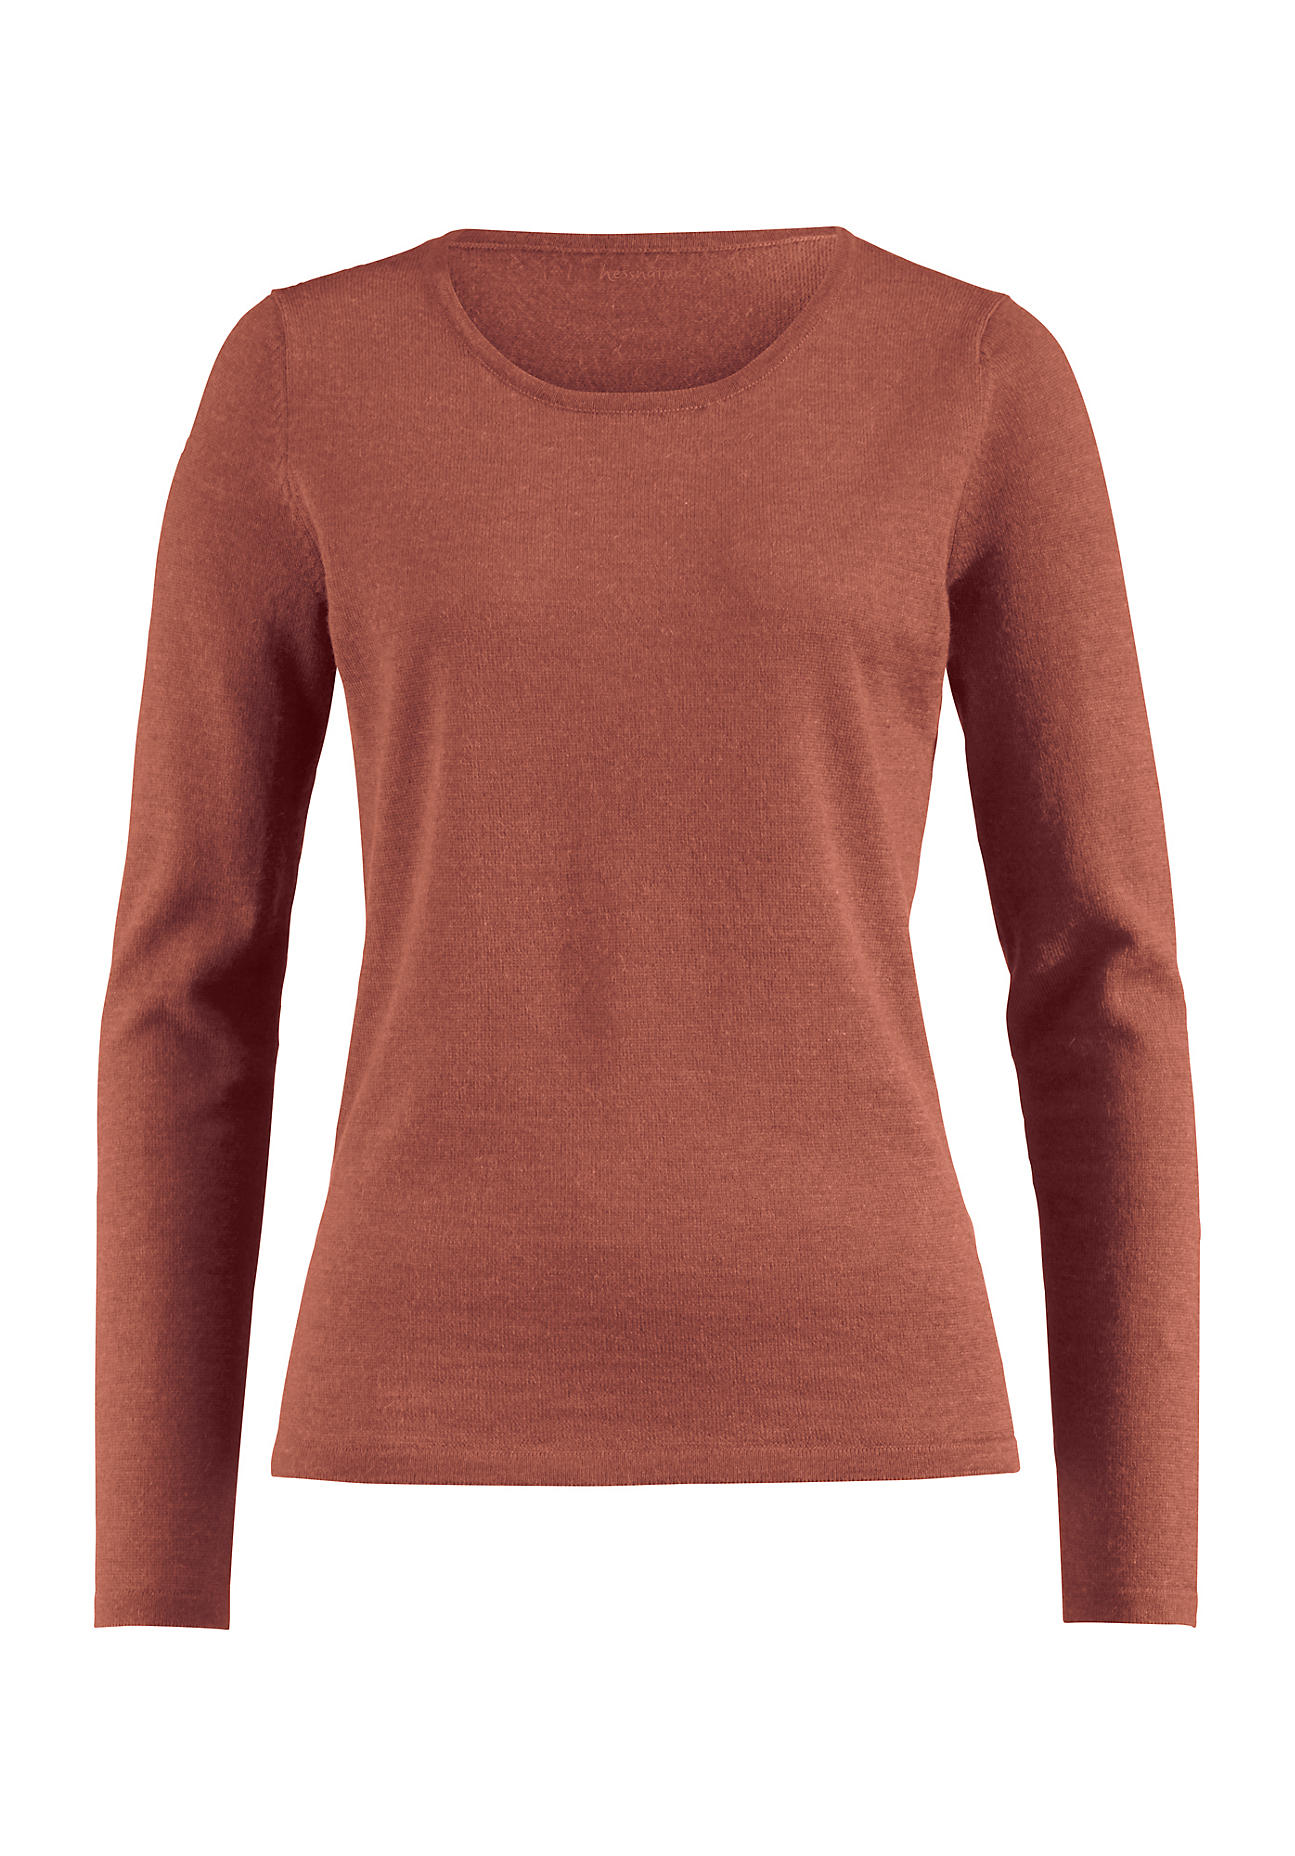 hessnatur pullover aus royal alpaca oberteile damenmode shirts. Black Bedroom Furniture Sets. Home Design Ideas